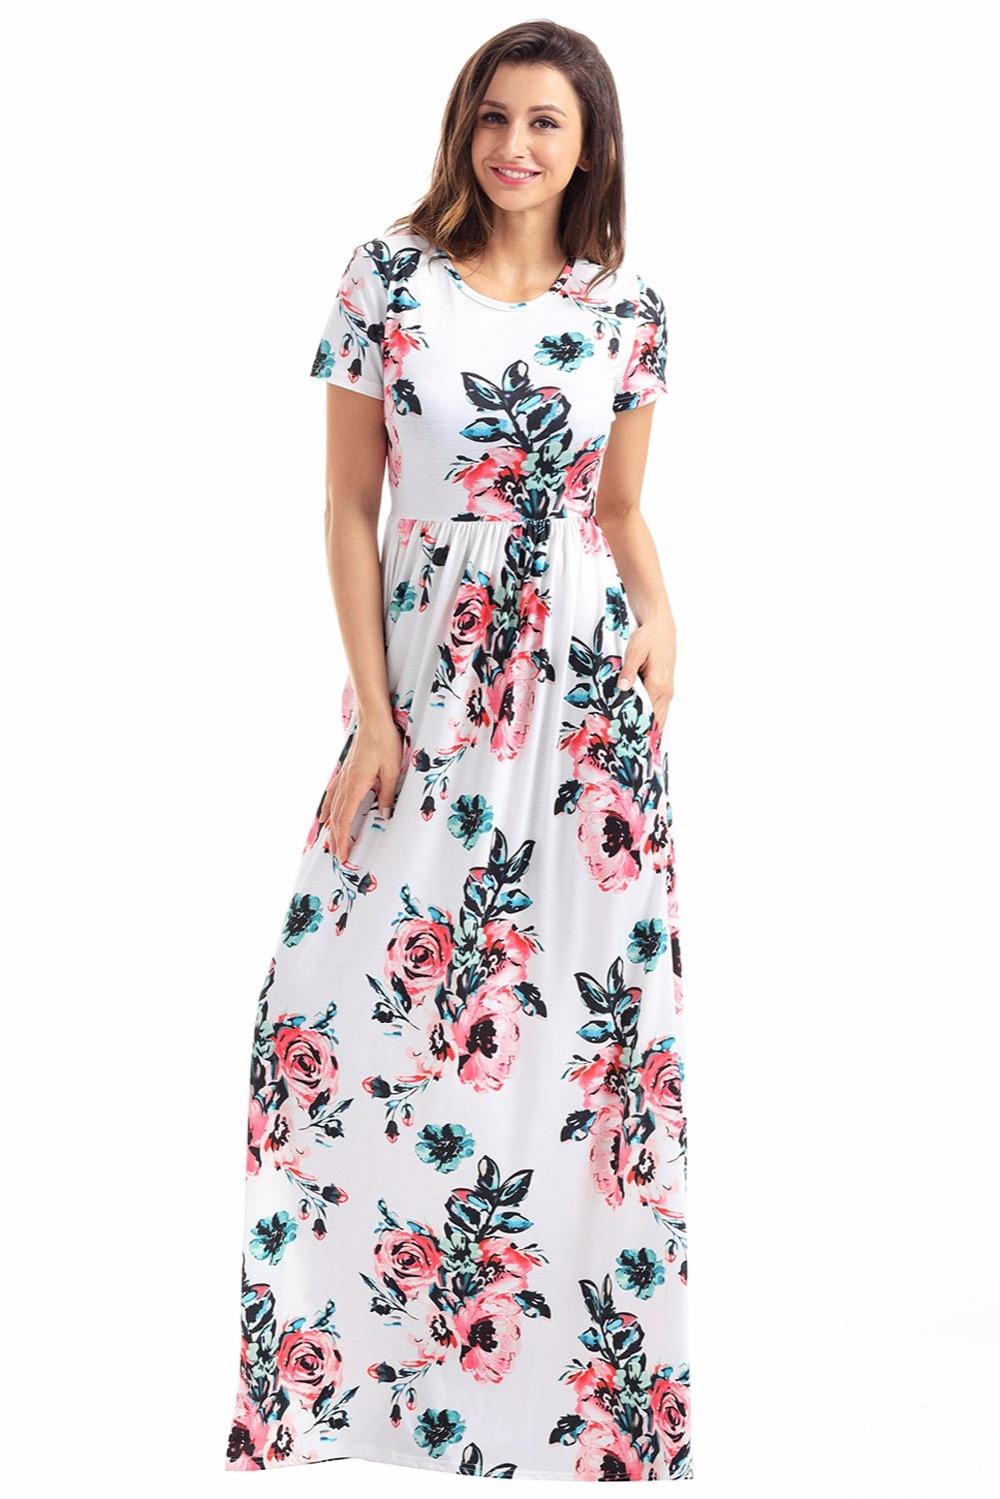 Boho Dresses New Arrival Beach Dresses Pocket Design Short Sleeve White Floral Maxi Dress Women Long Dress cheap clothes china